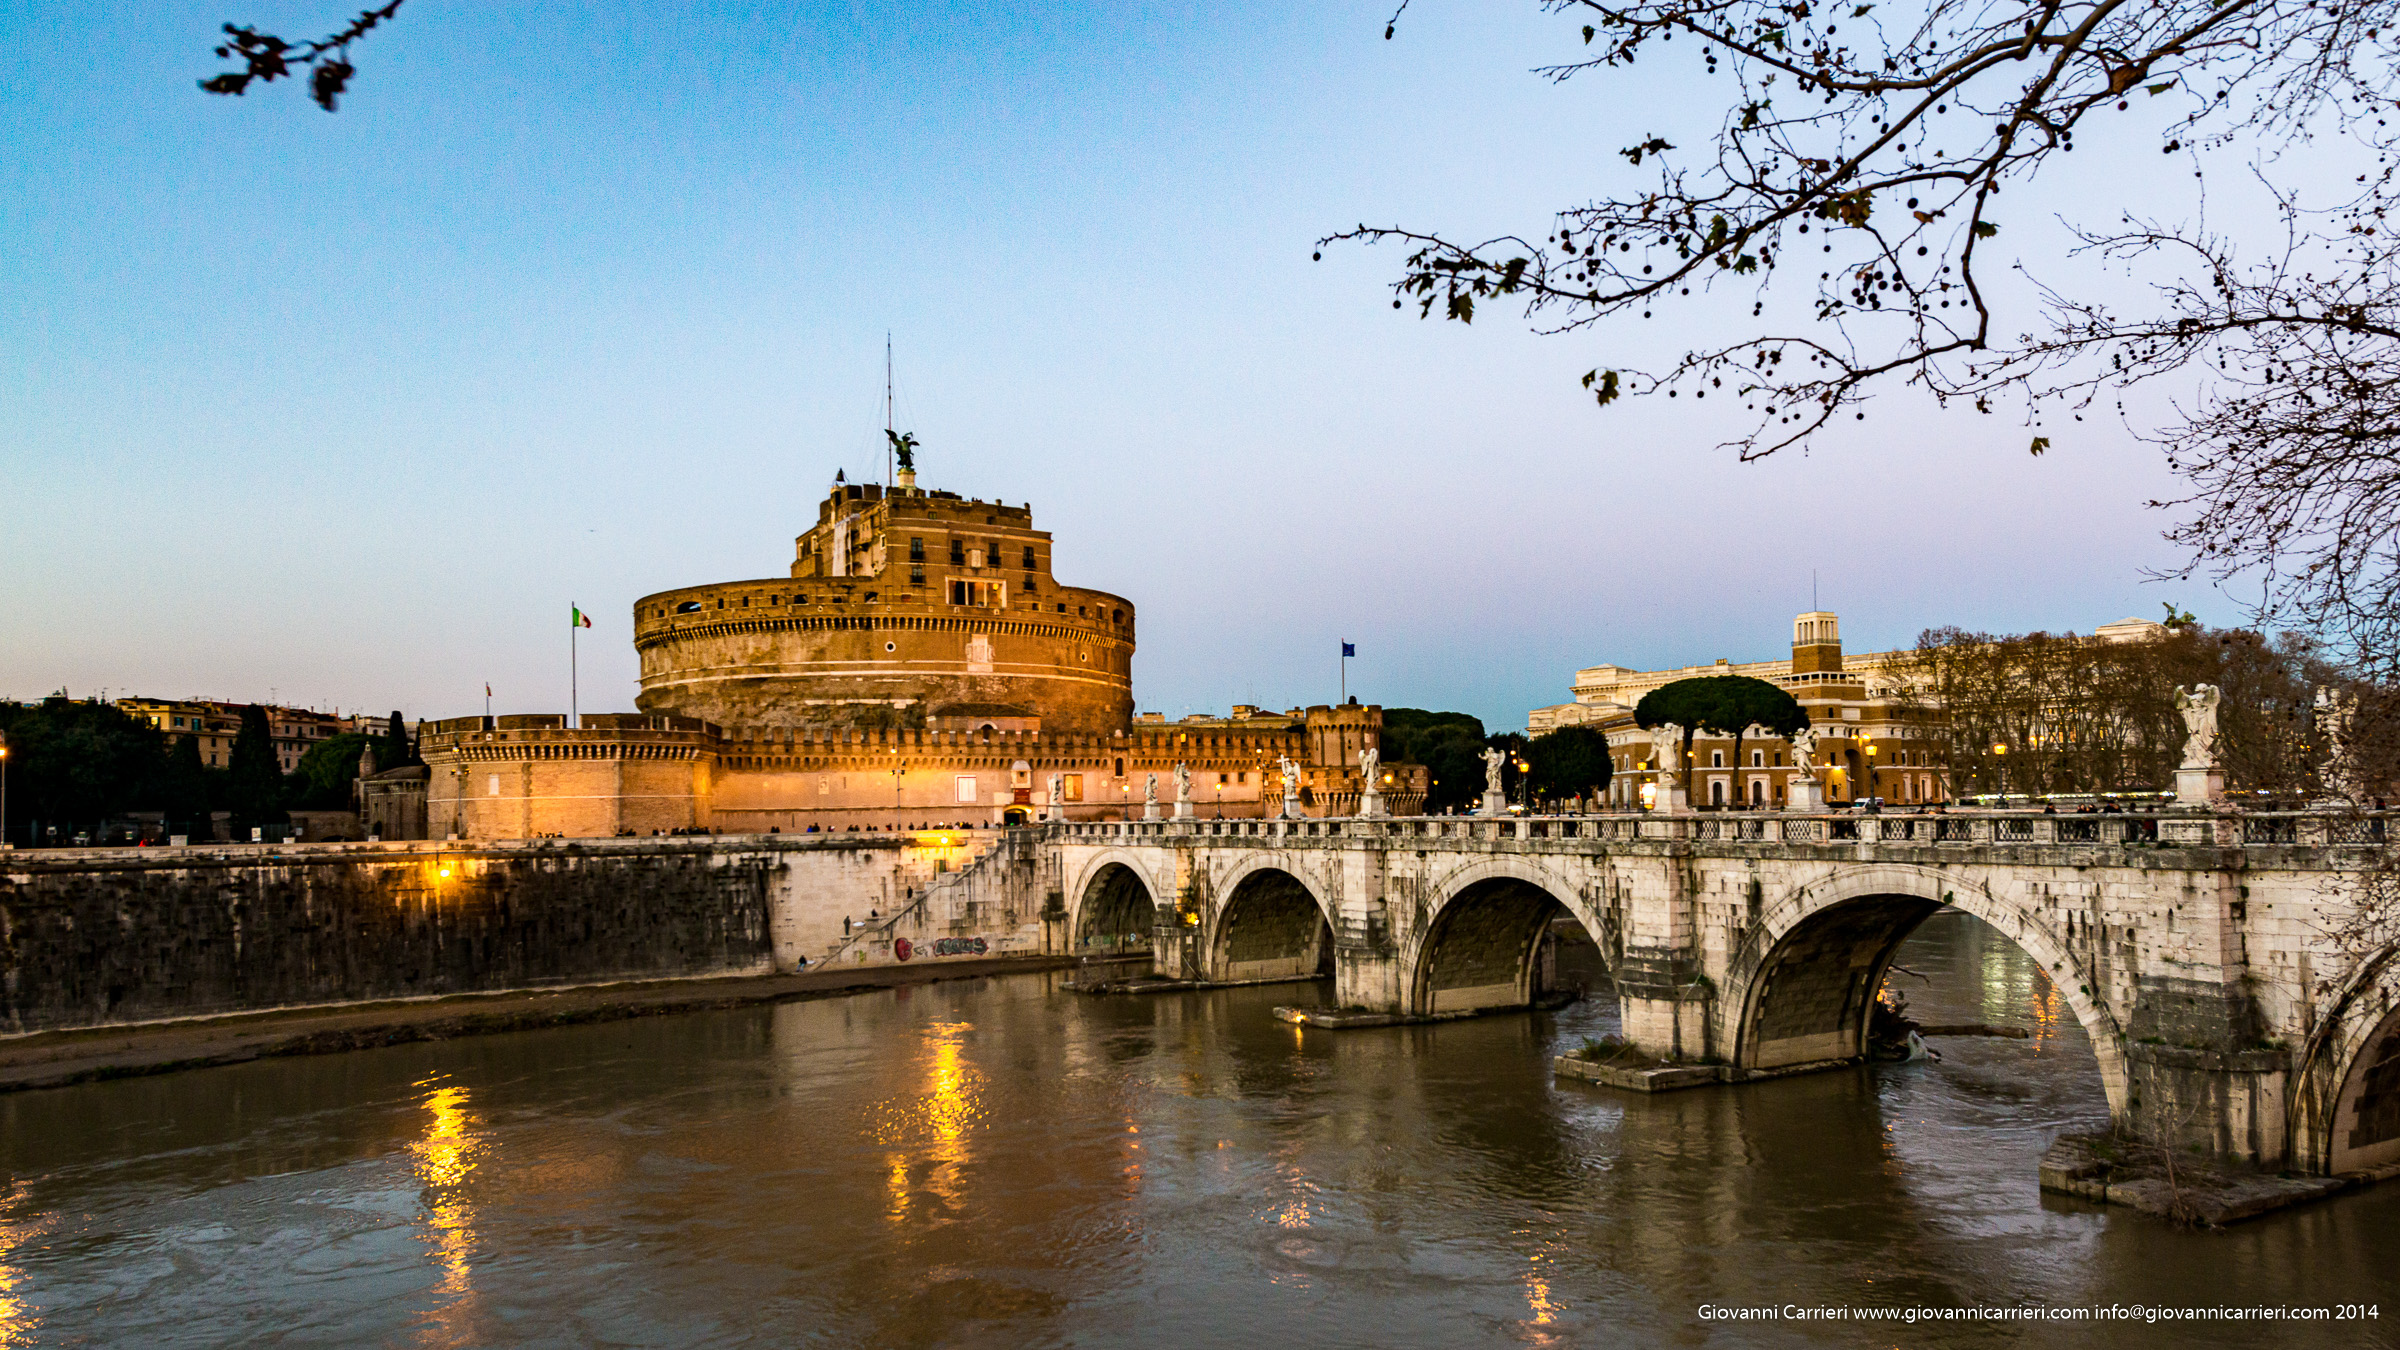 Castel Sant'Angelo, il ponte omonimo ed il Tevere